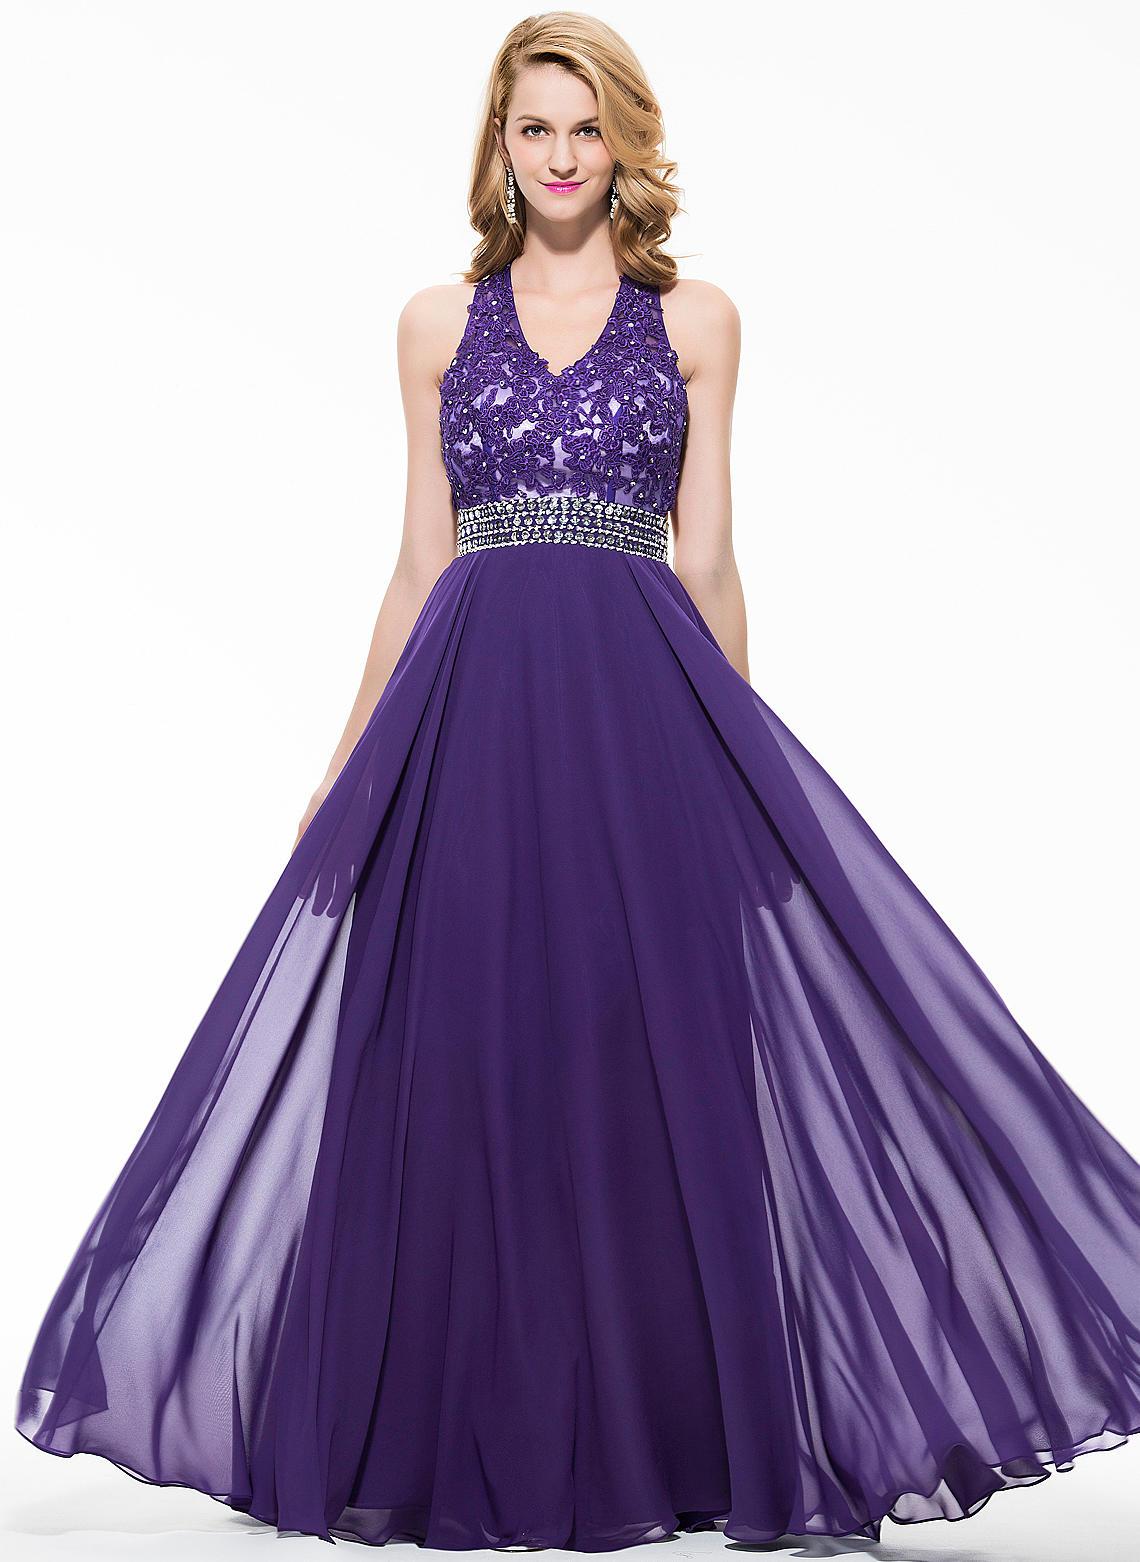 583474fdadf Chiffon Sleeveless A-Line Princess Prom Dresses V-neck Beading Appliques  Lace Sequins